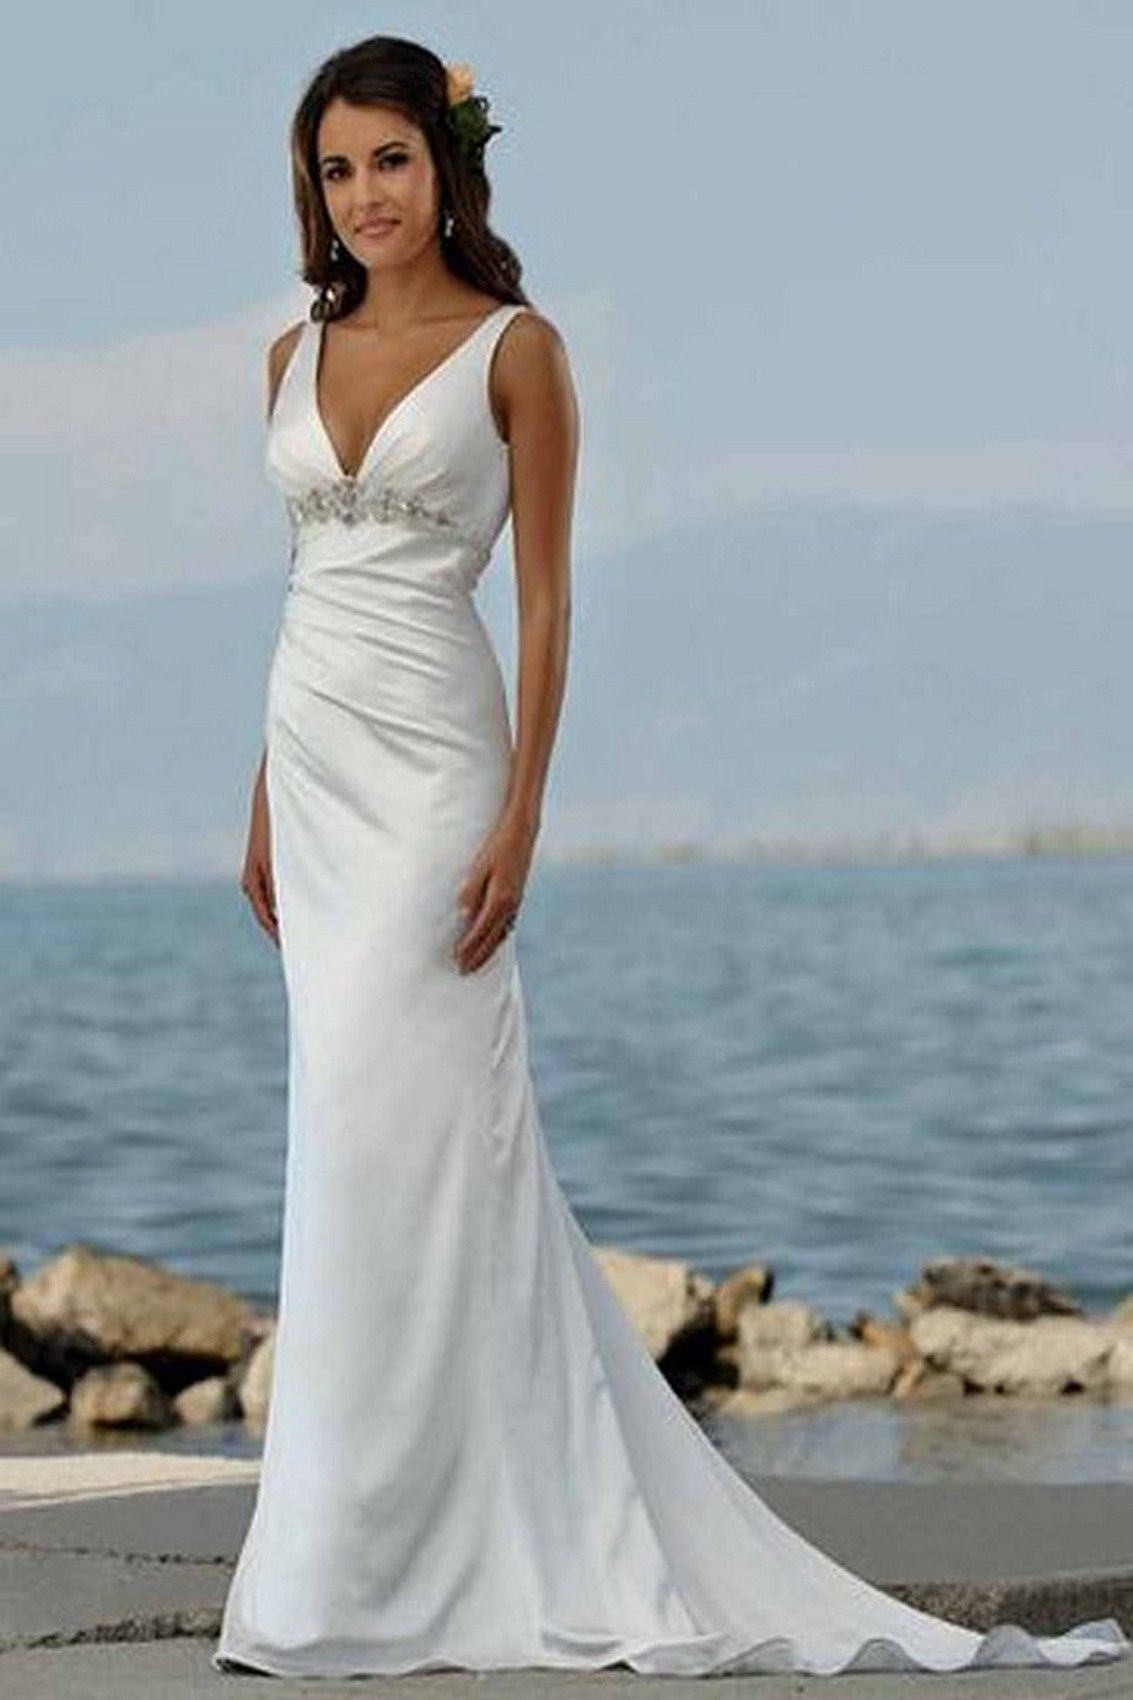 Simple and Casual Wedding Dress Ideas 2017 | Casual wedding, Dress ...